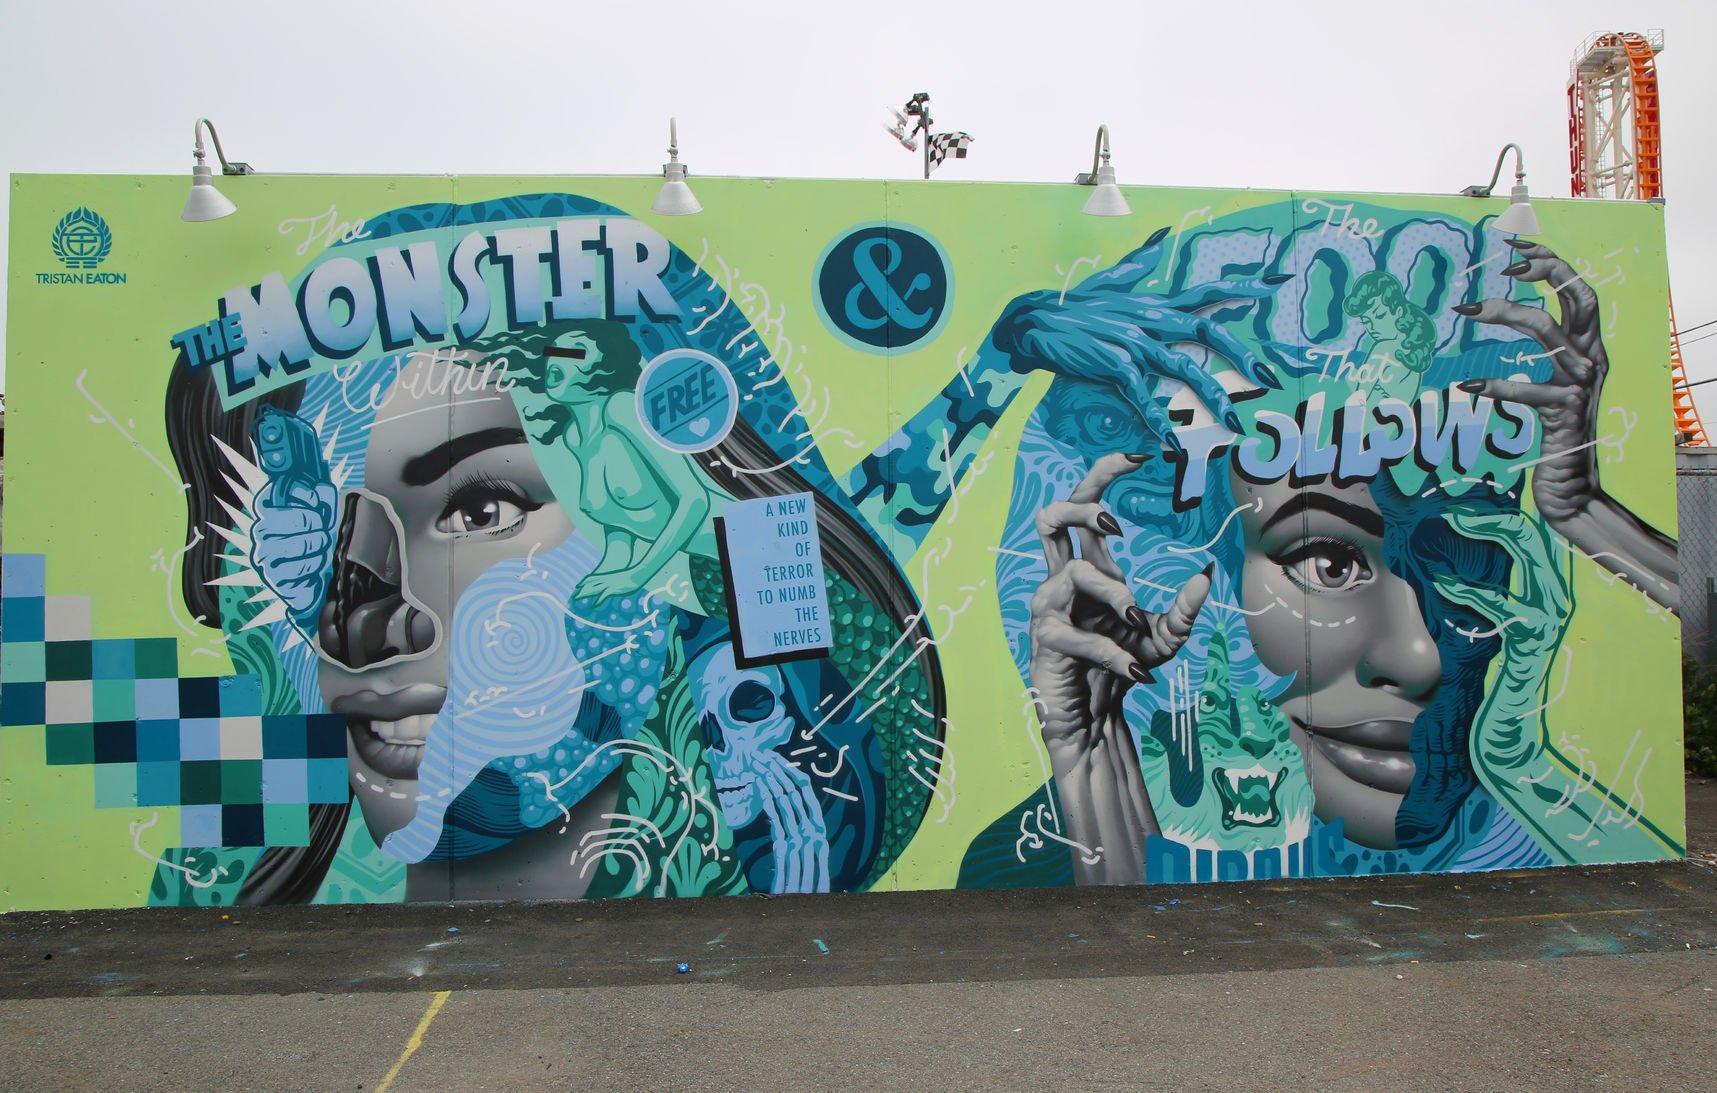 Street art NYC, Tristan Eaton